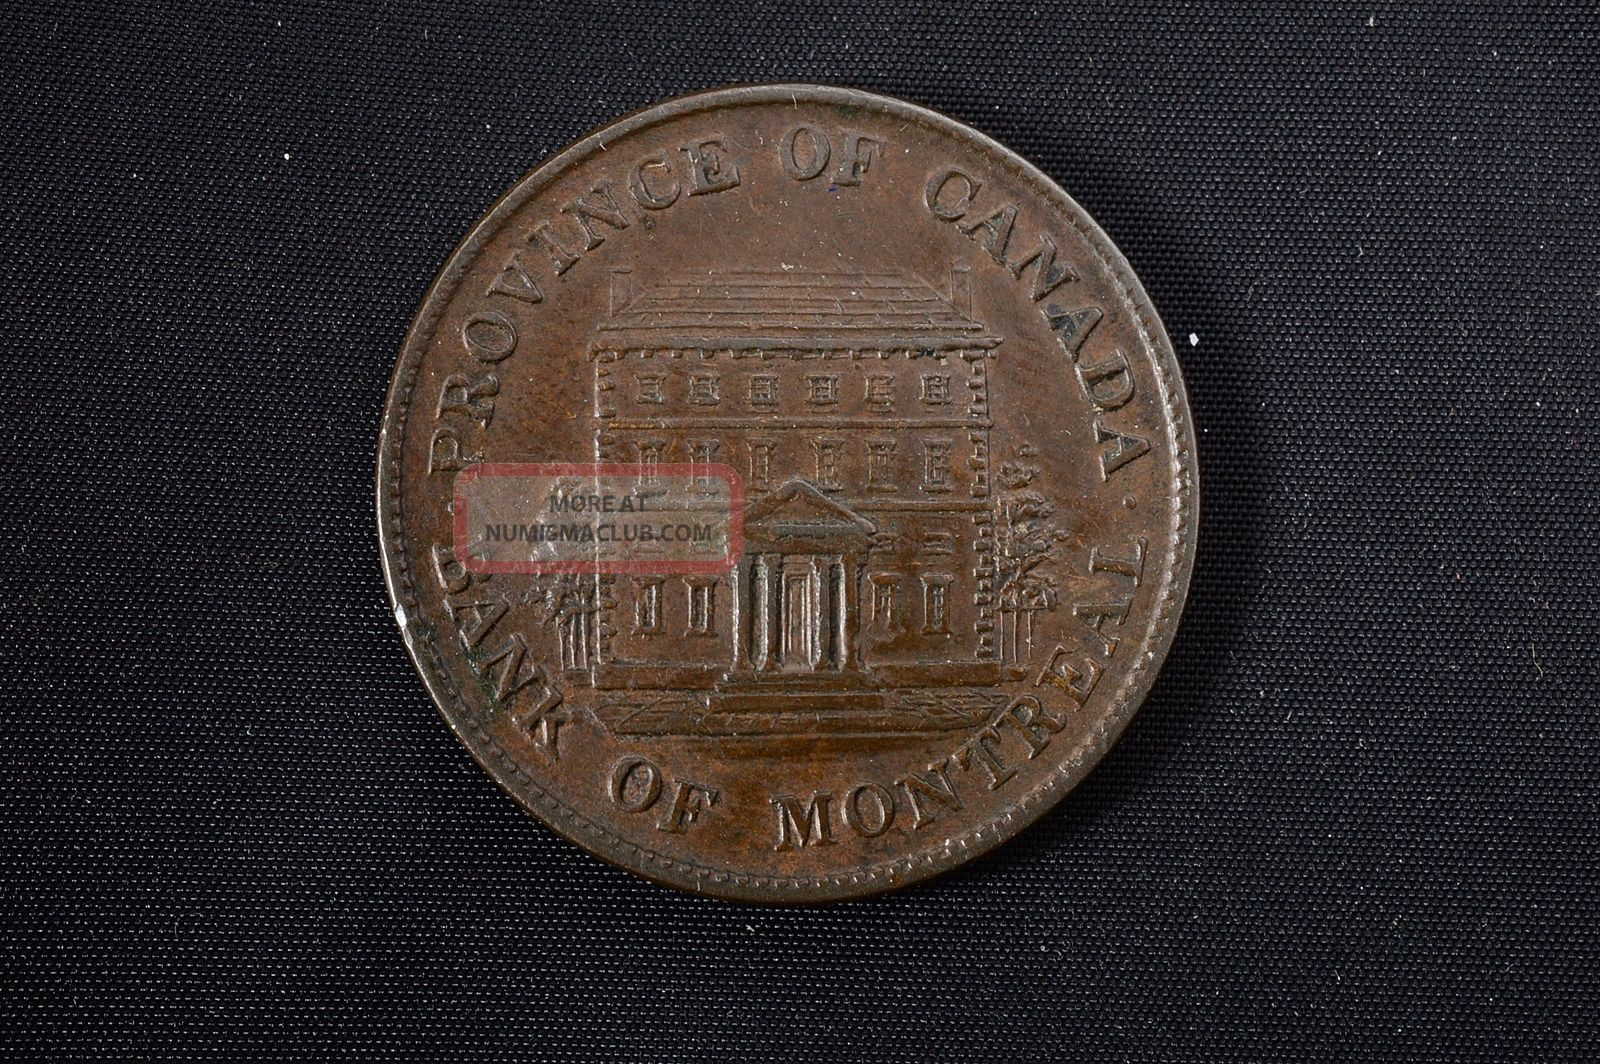 Rare 1844 Canada - Bank Of Montreal - Half Penny Token - Detail No Res Coins: Canada photo